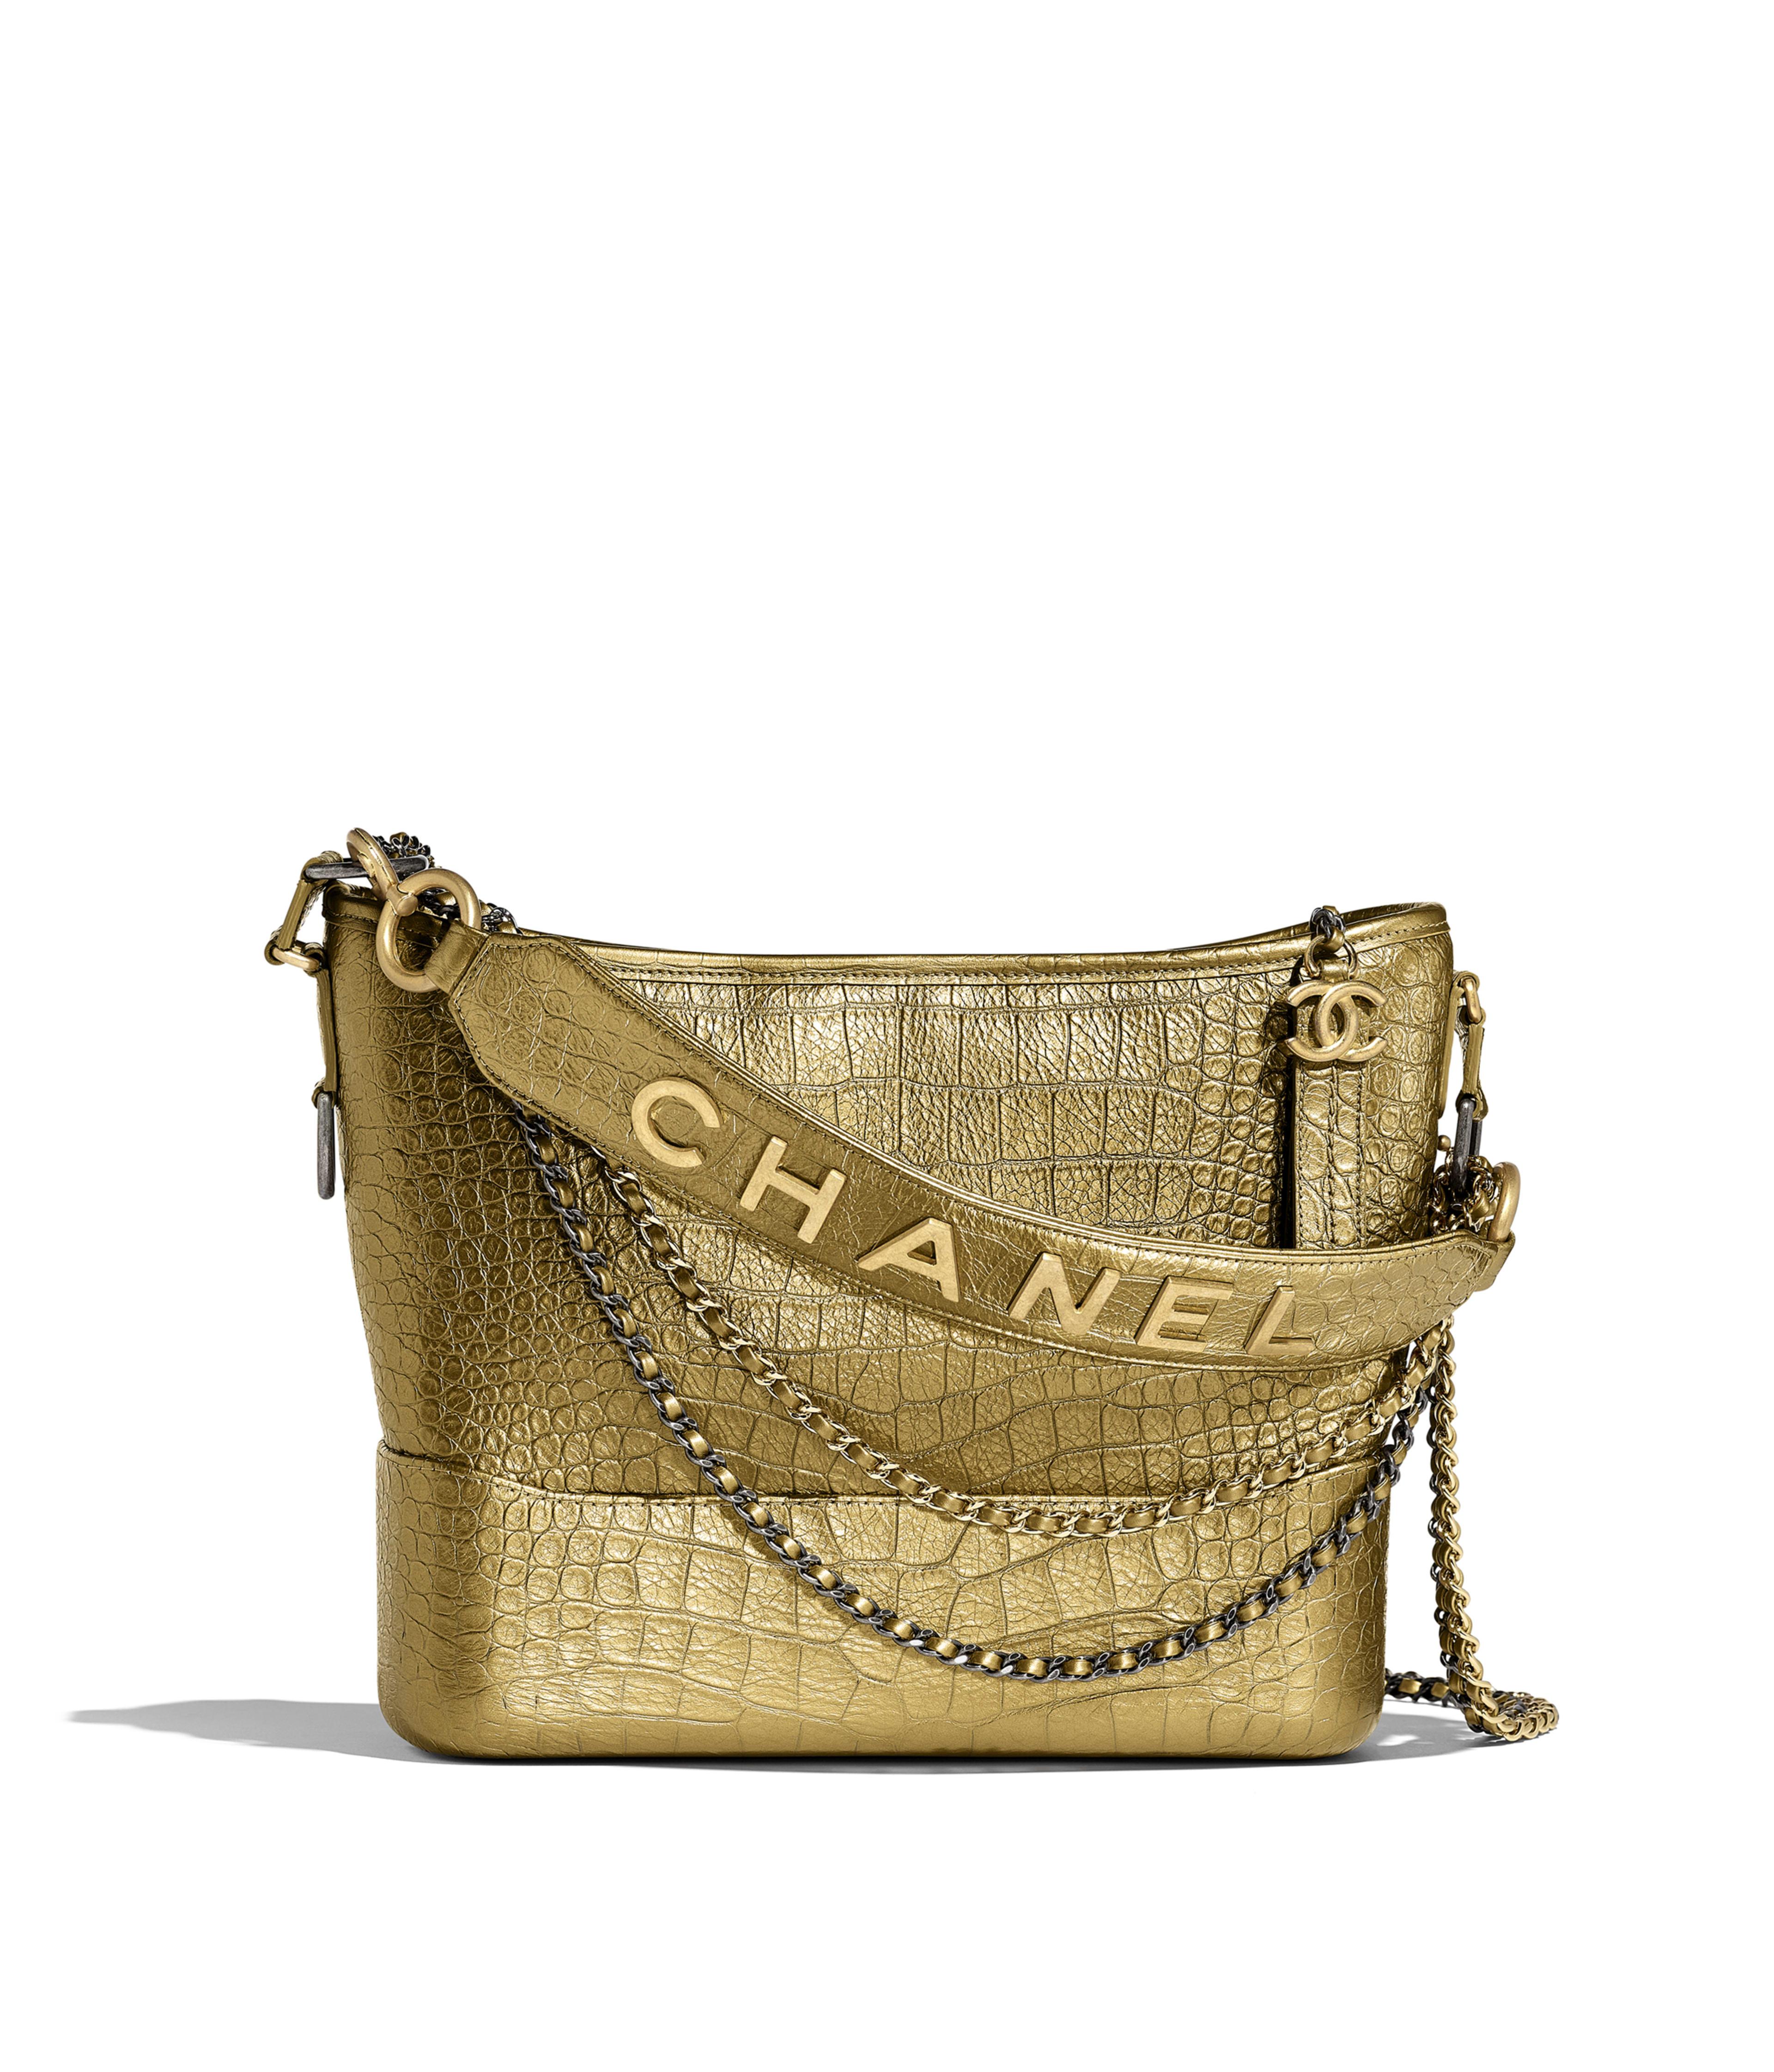 6e2ddebc4cbc CHANEL'S GABRIELLE Hobo Bag Metallic Crocodile Embossed Calfskin, Gold-Tone  & Silver-Tone Metal, Gold Ref. AS0866B00814N4775